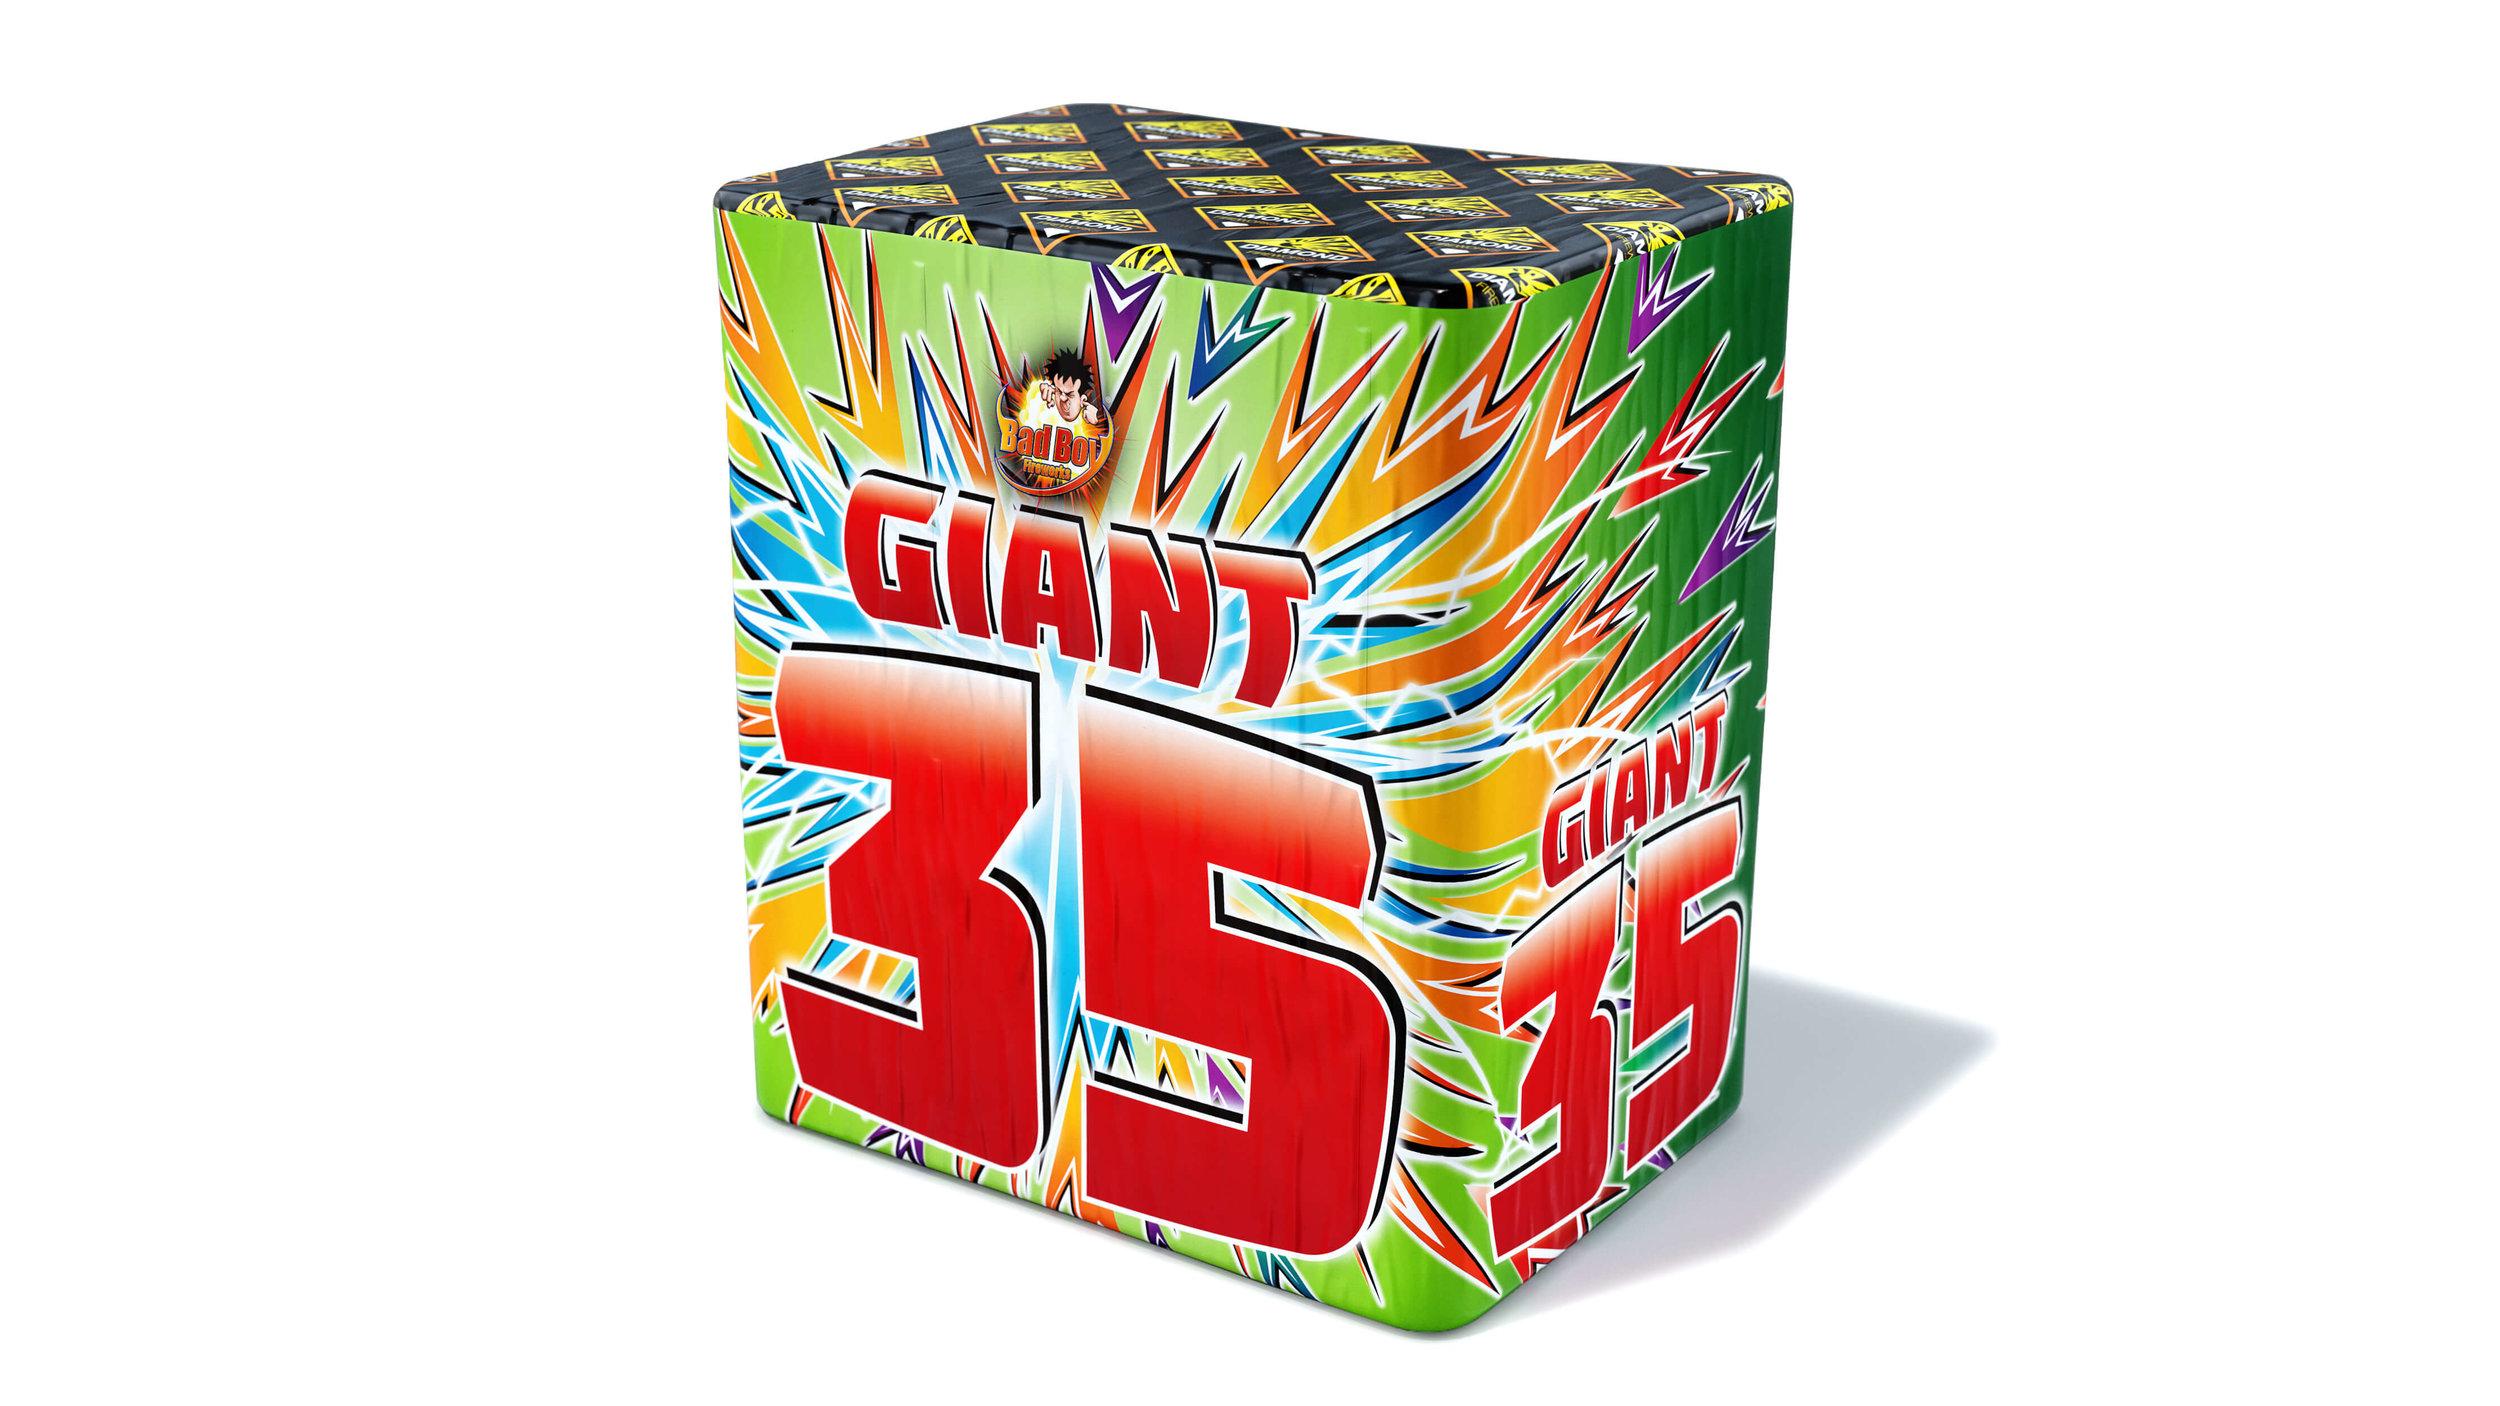 Giant 35 Shot - RRP £105.00